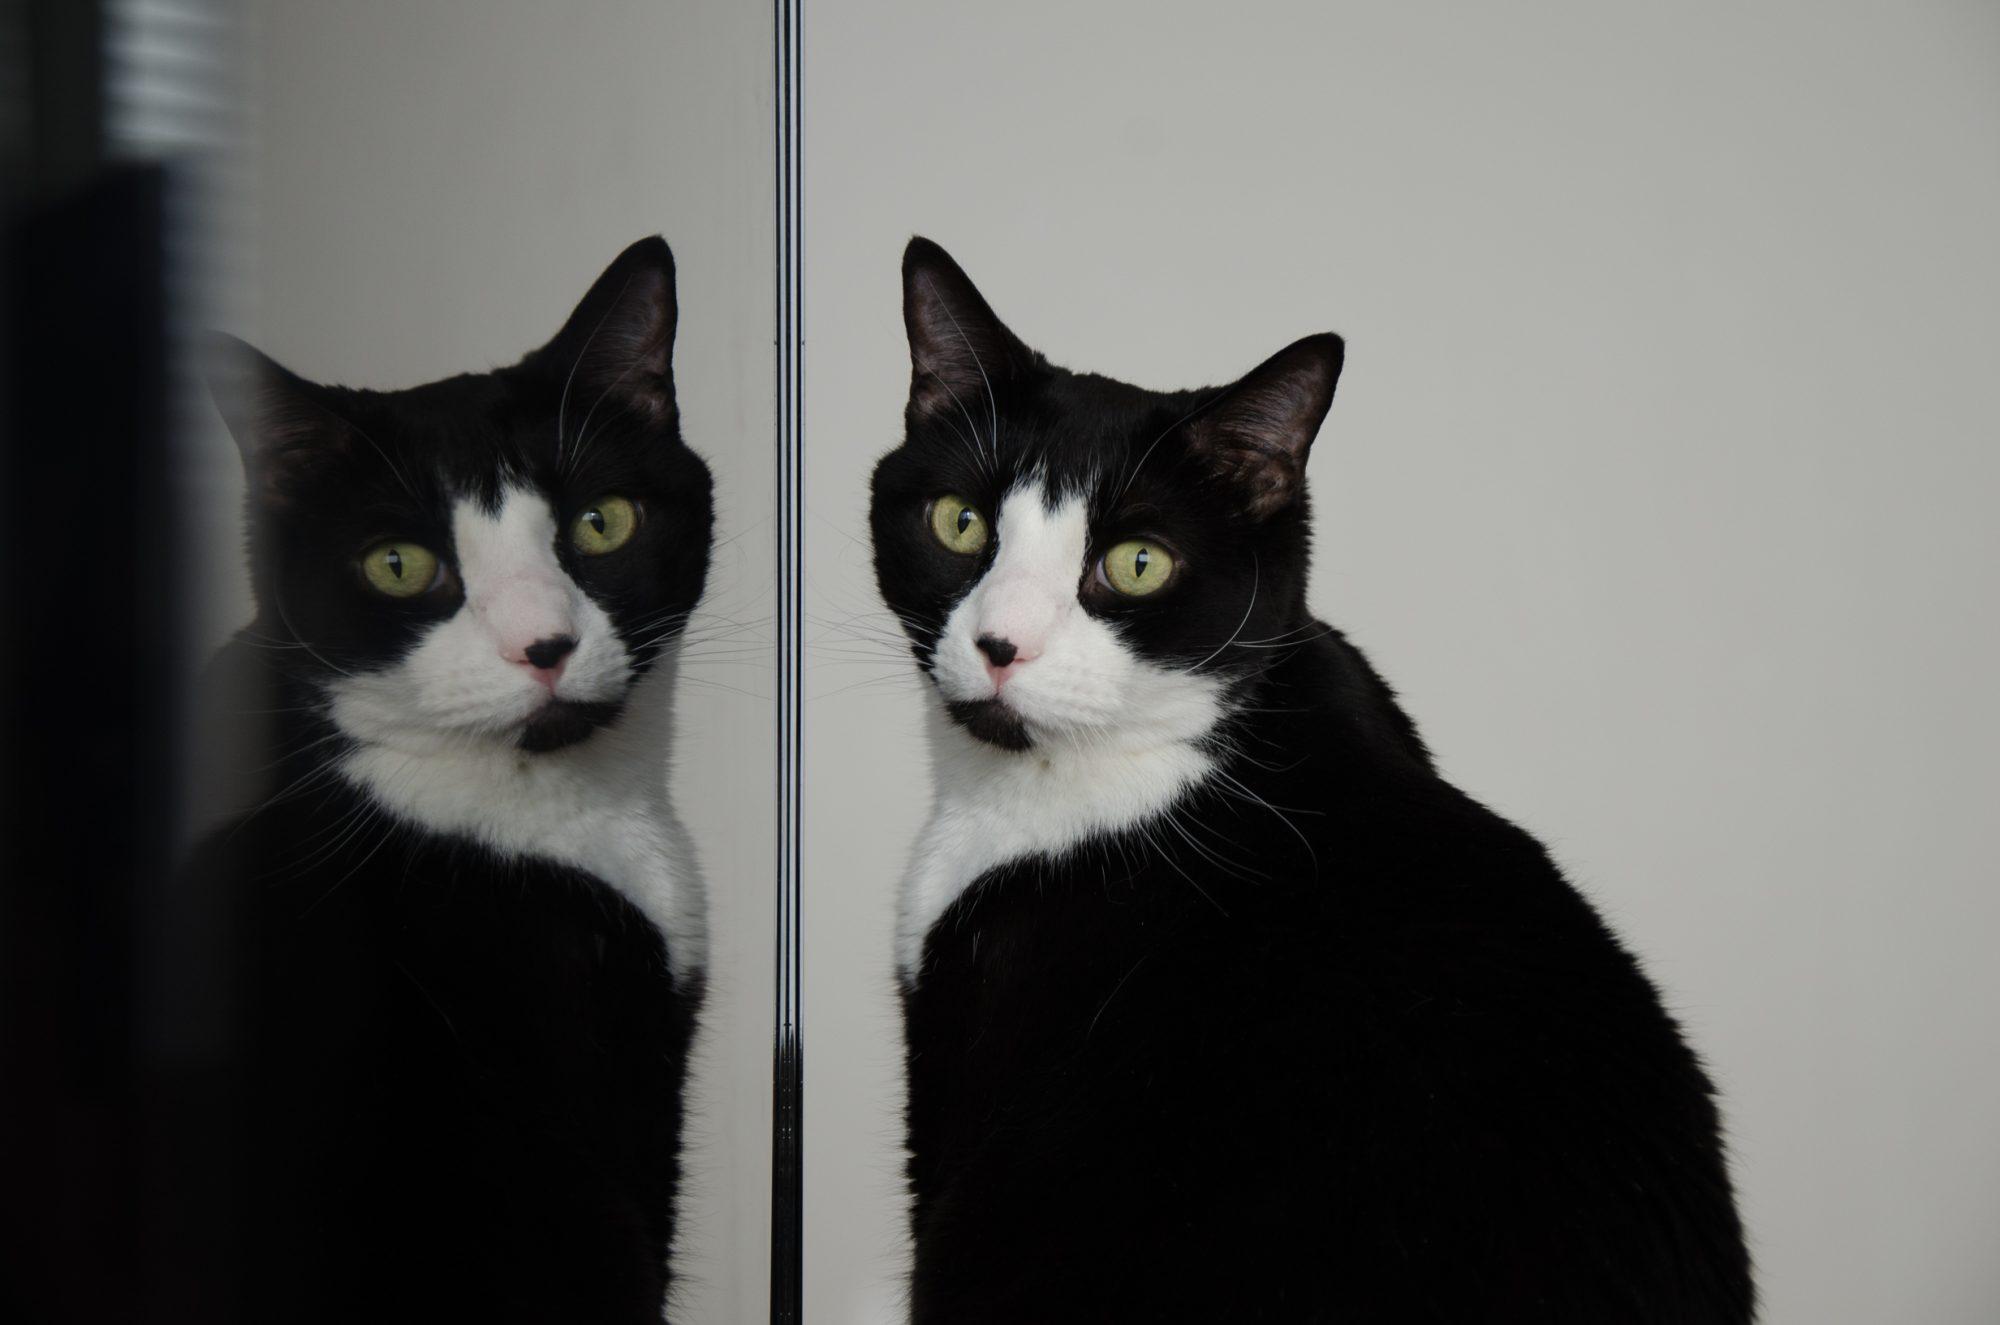 Gato clone - generic photo; Mr. Tufts Jr.